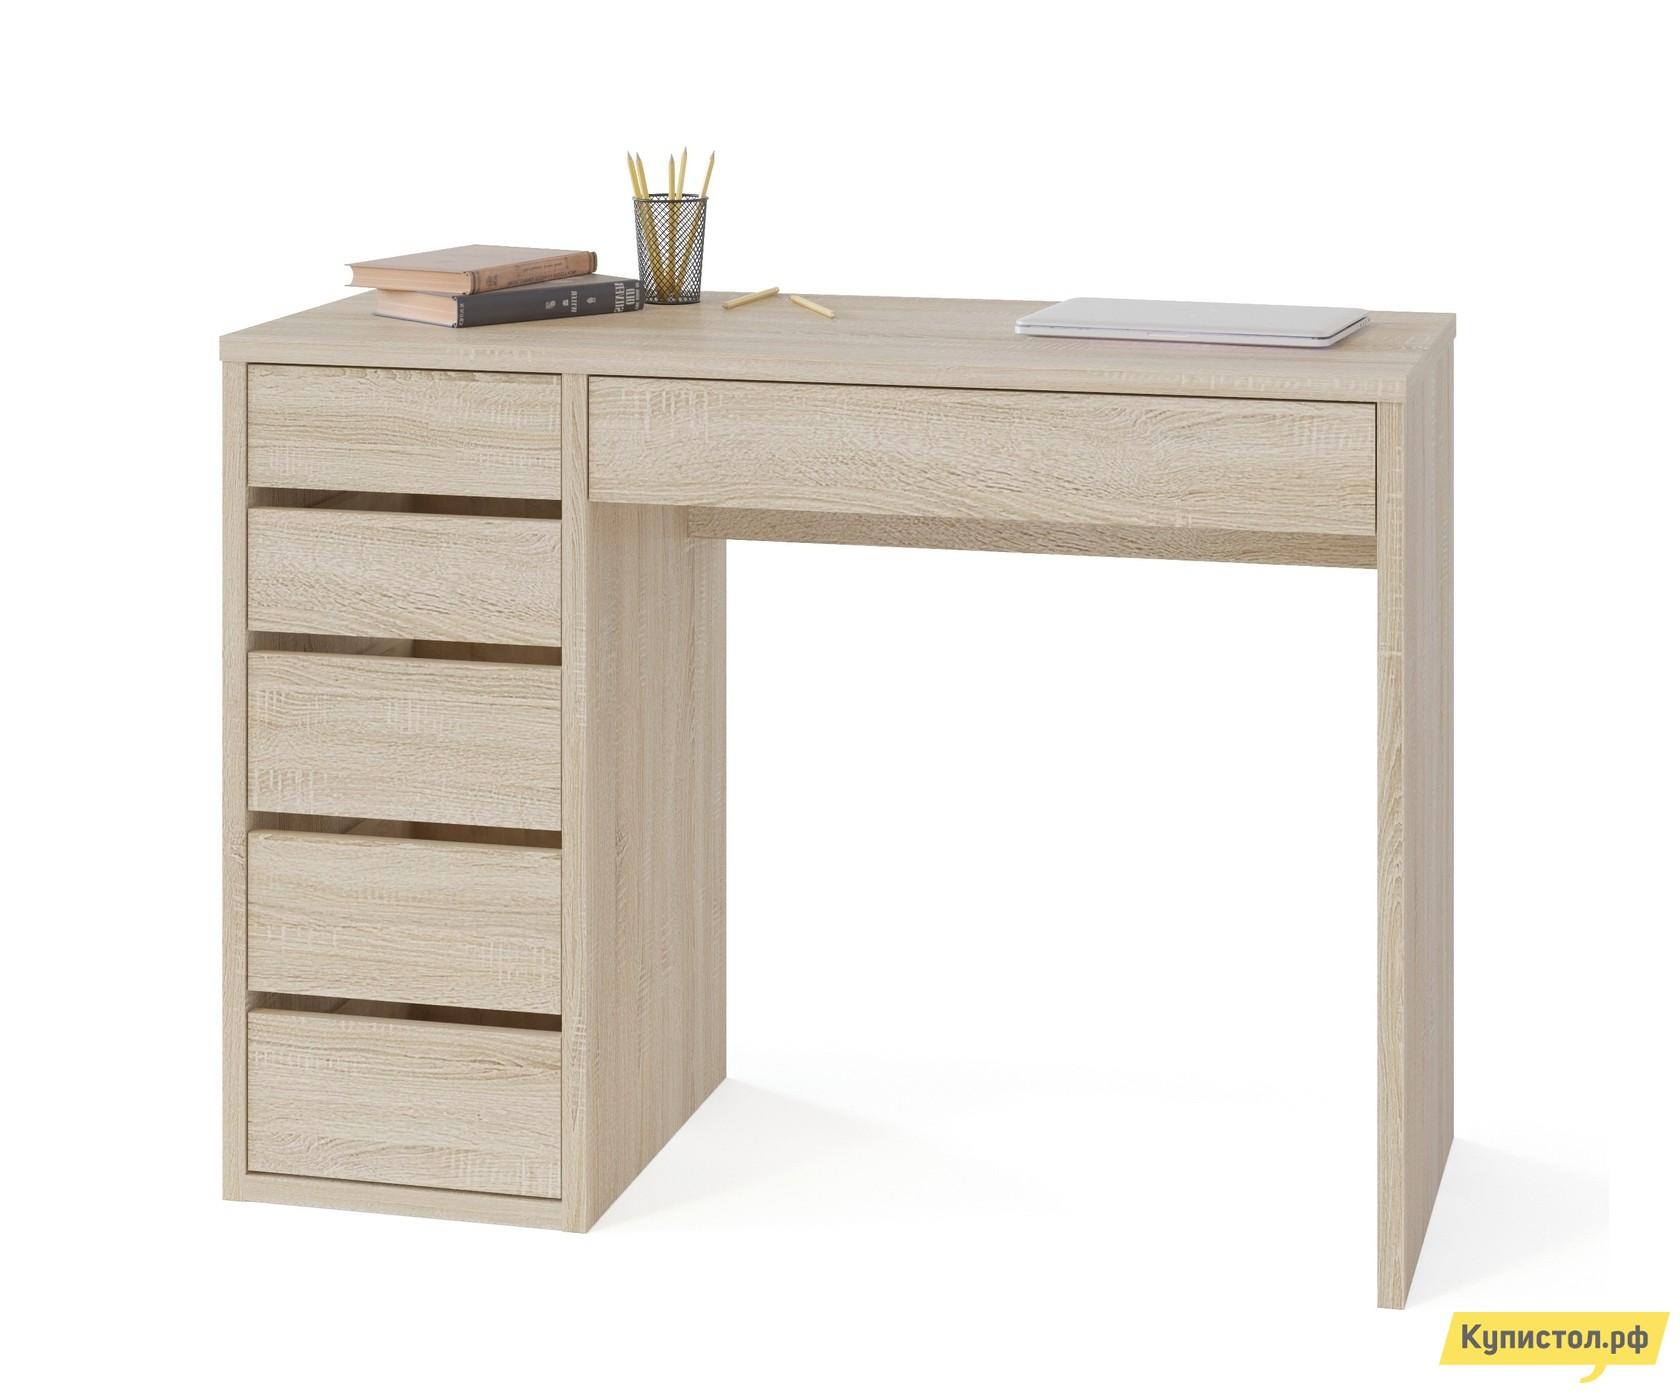 Письменный стол Тайга СПм-10 Дуб Сонома